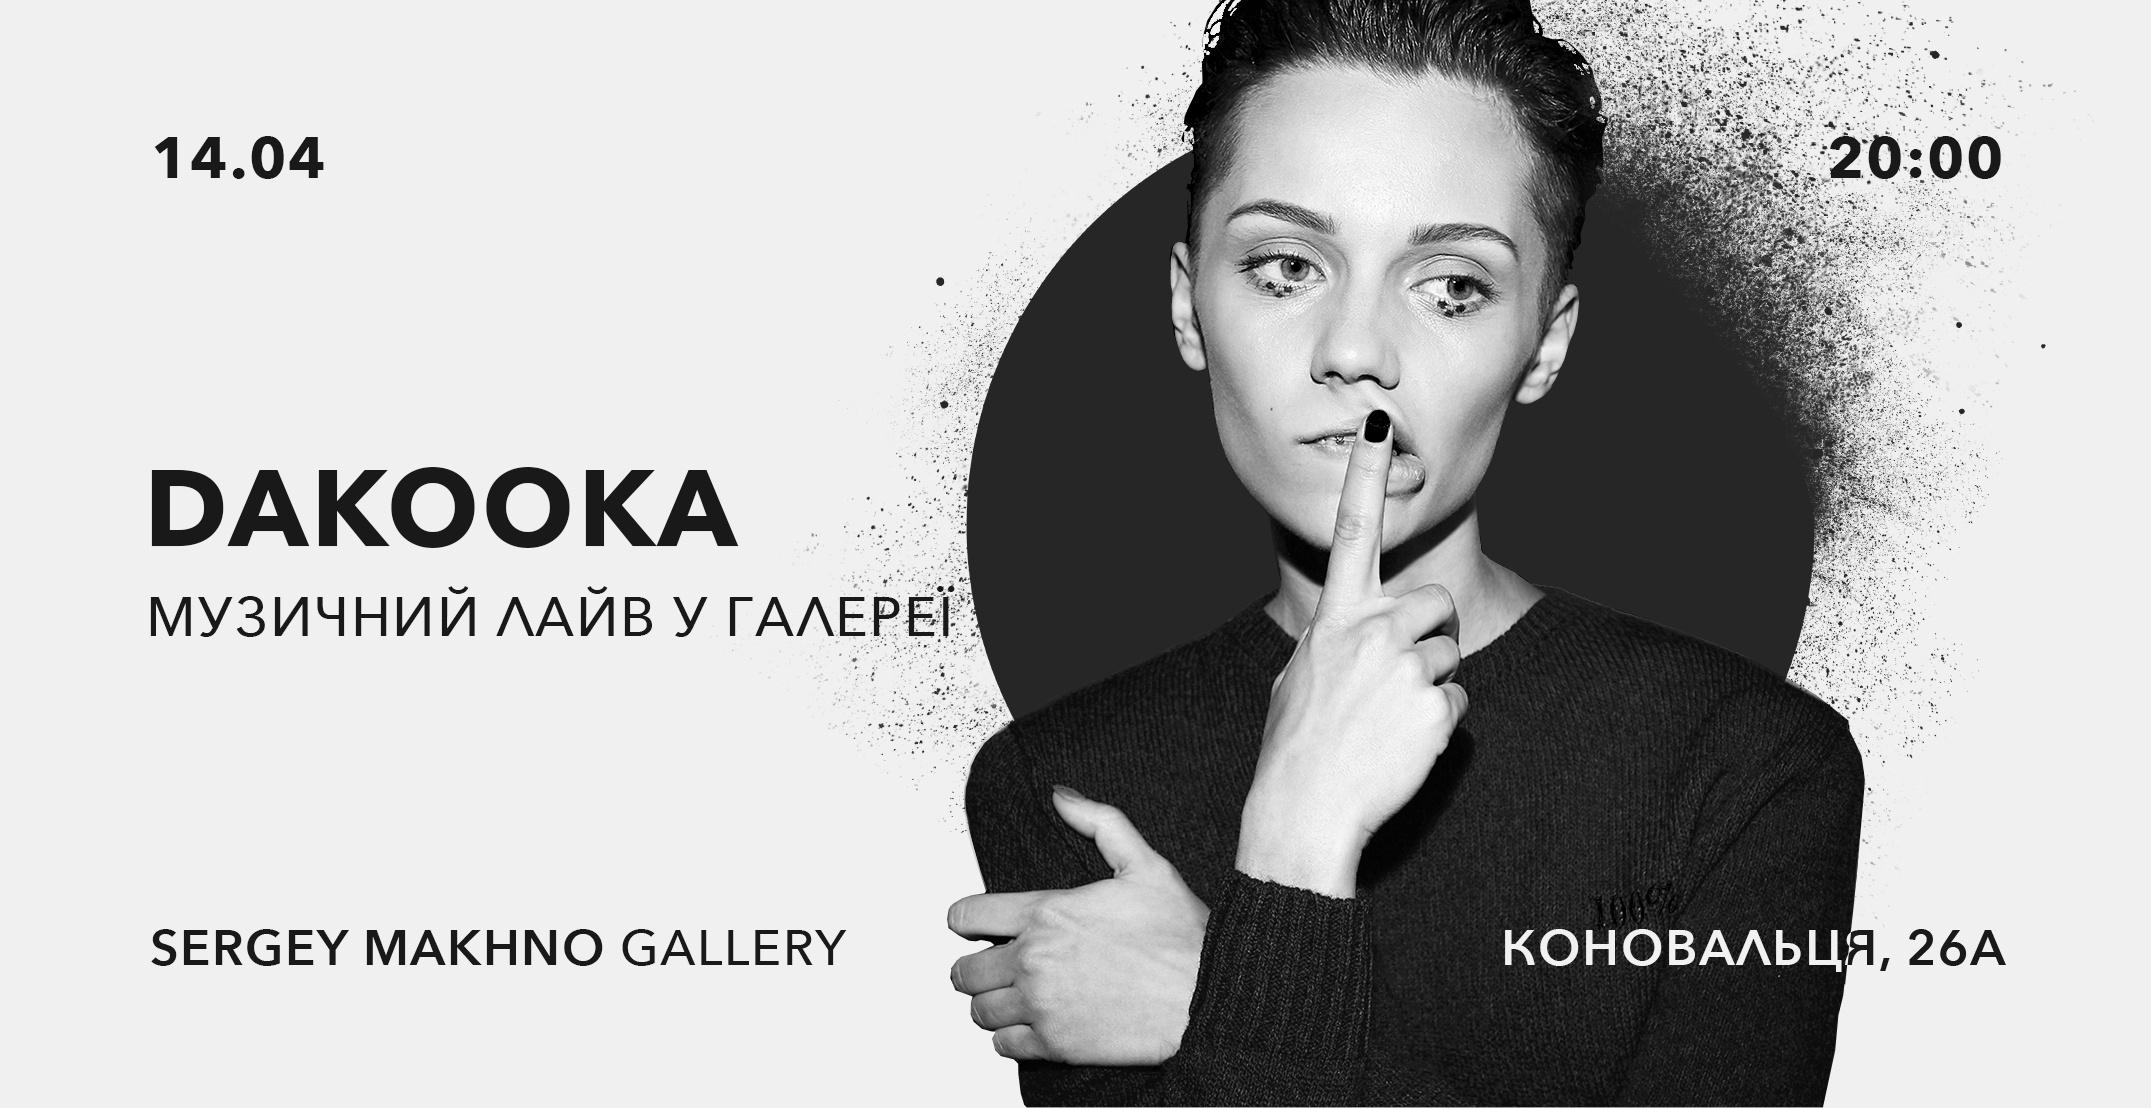 dakooka_14.04_01